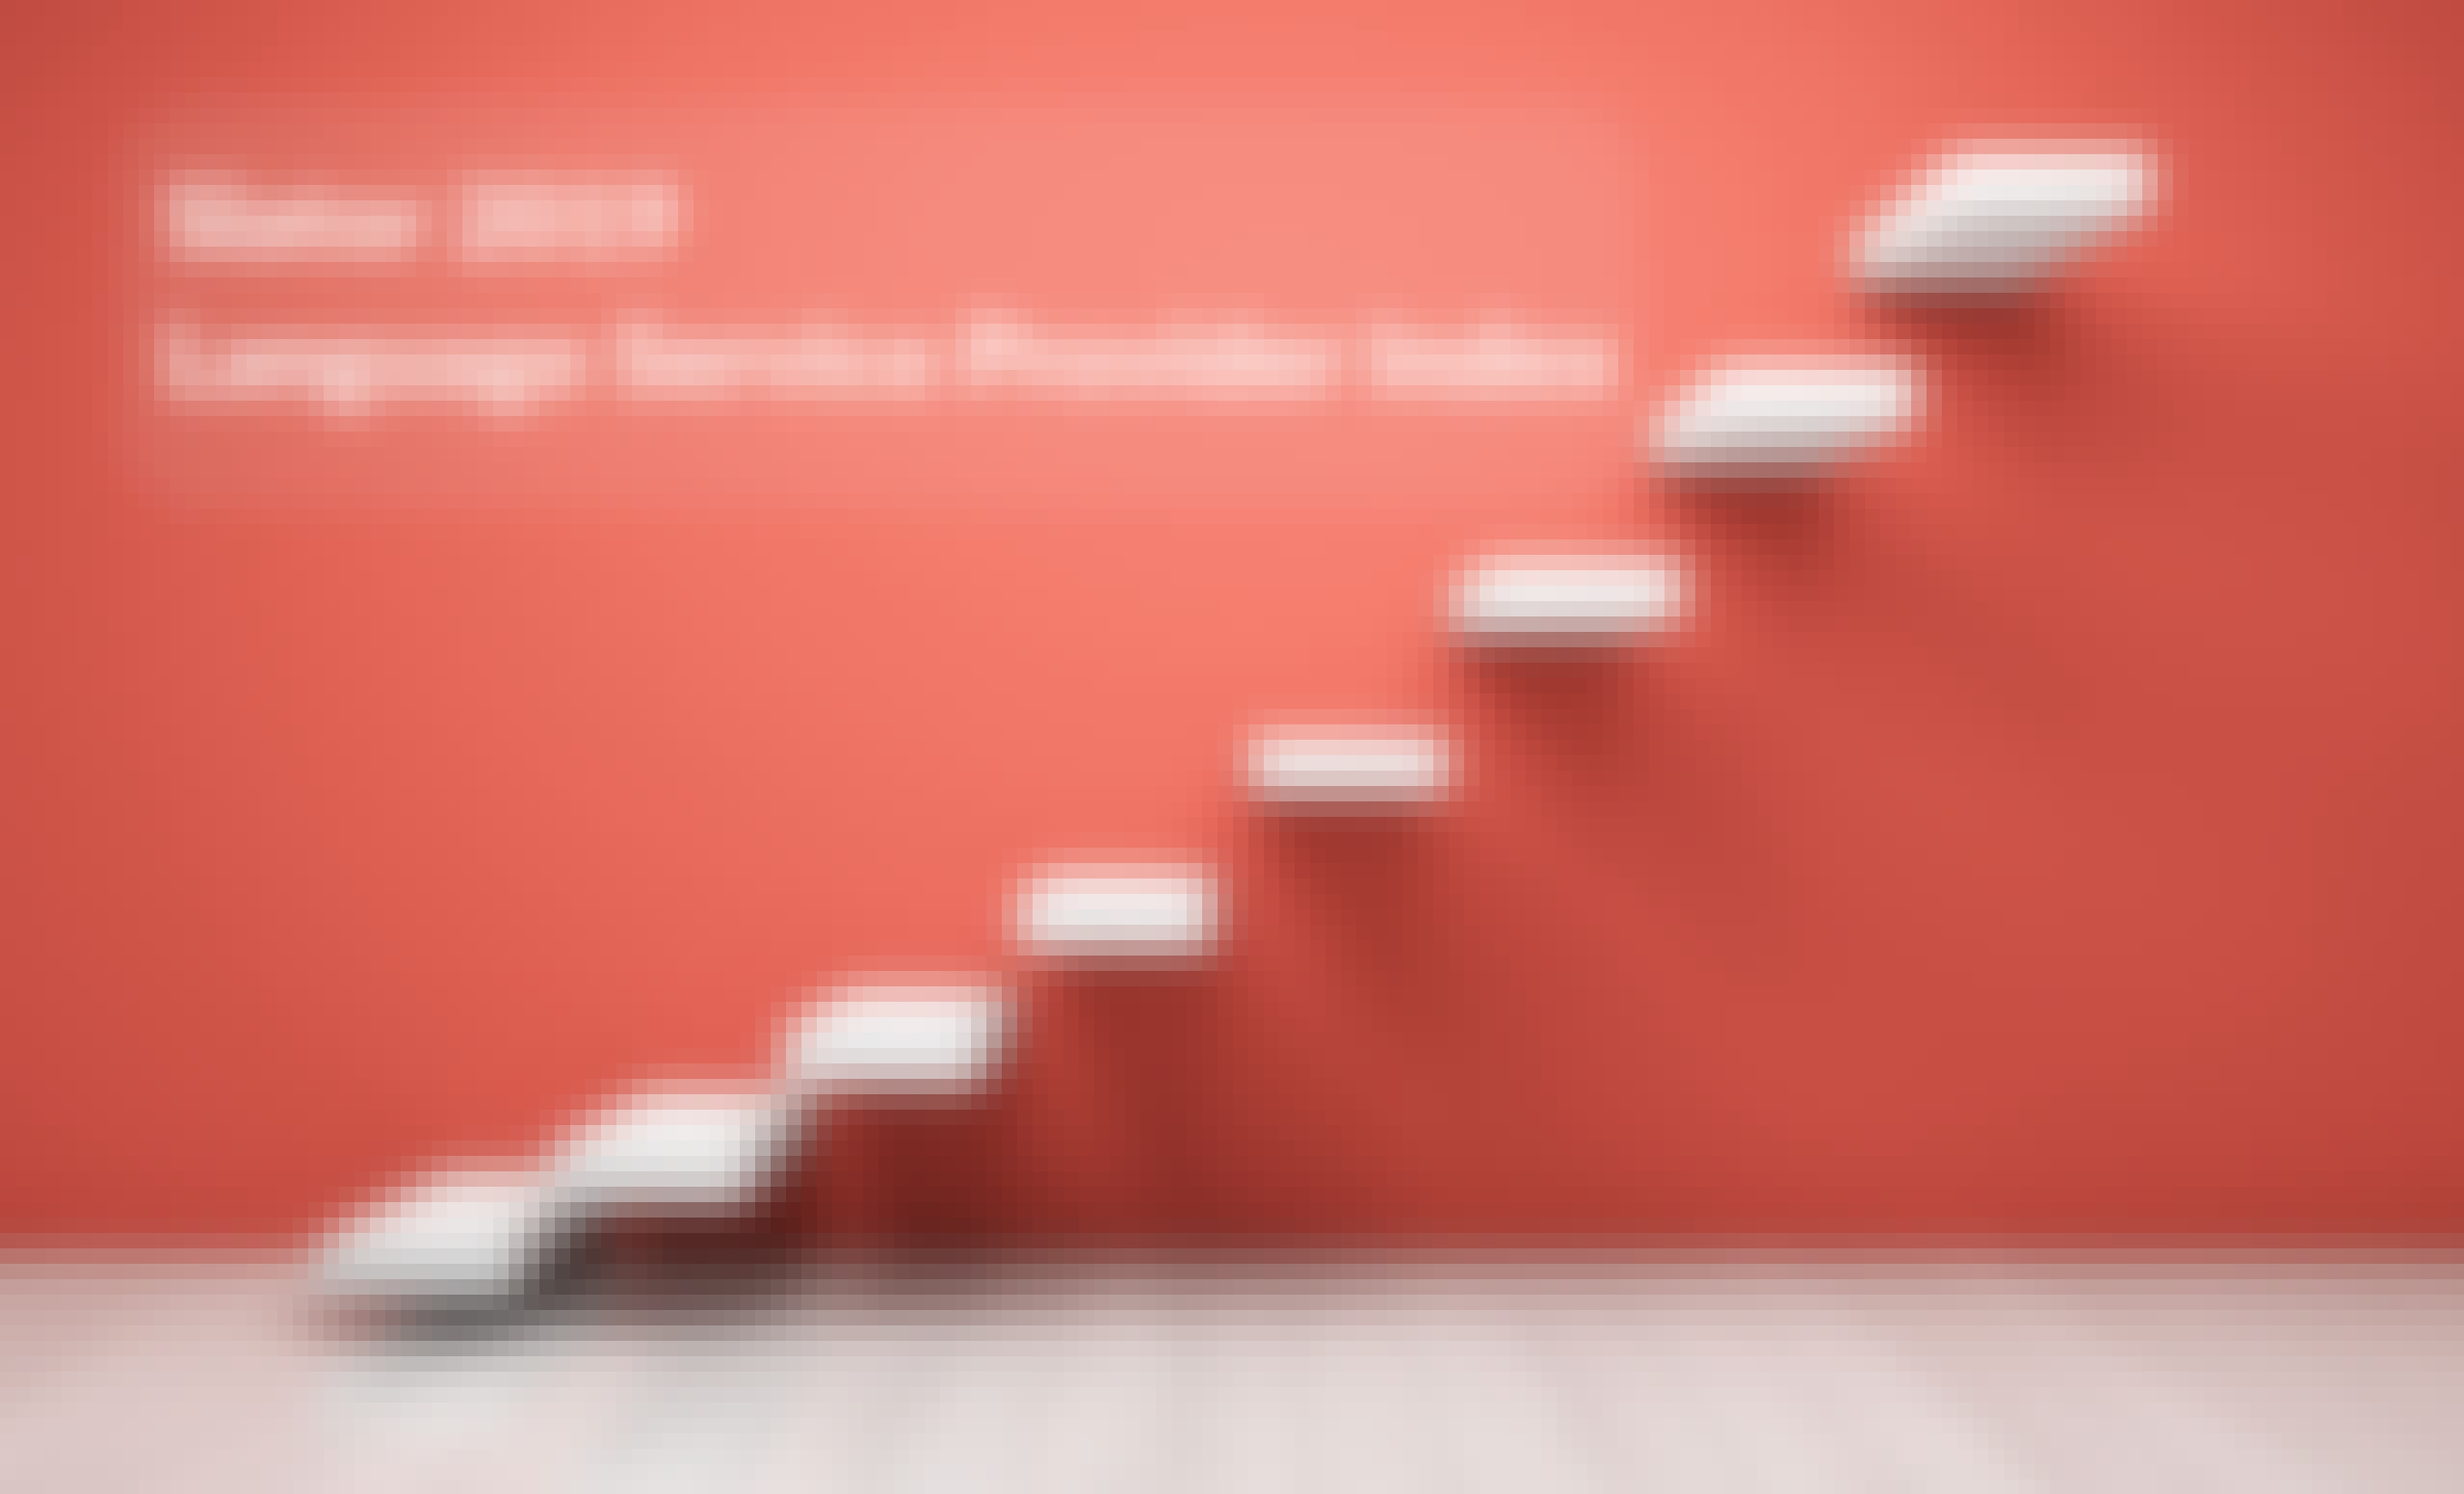 2019 Slator Stairs